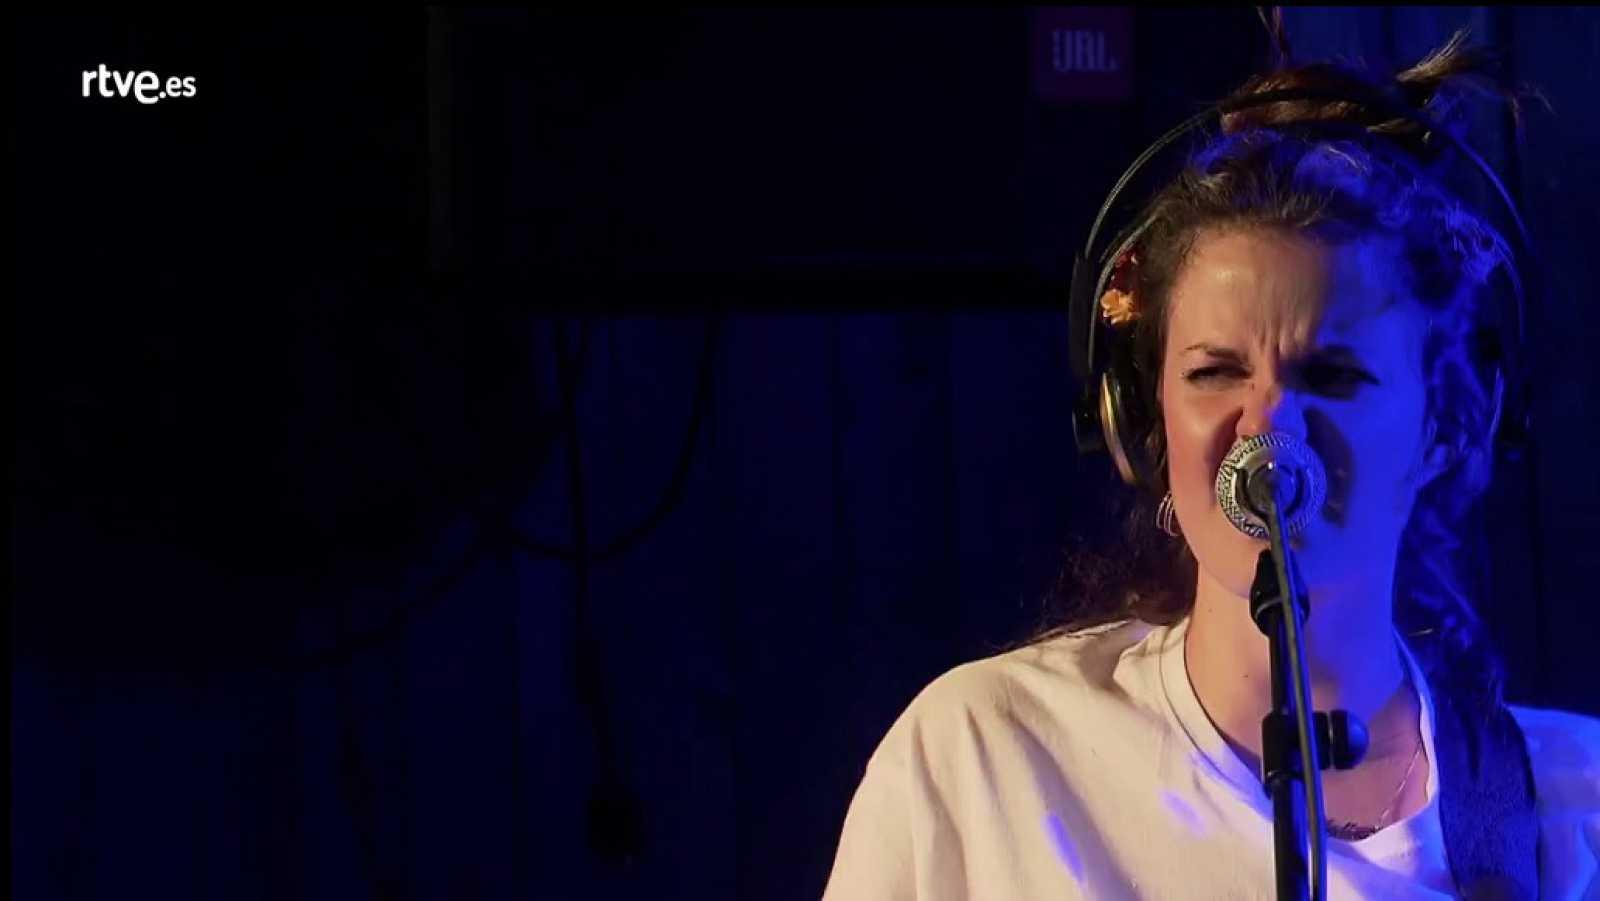 VÍDEO: Hinds, 'New for you' (Directo en sala Moby Dick) - 12/04/18 - ver ahora